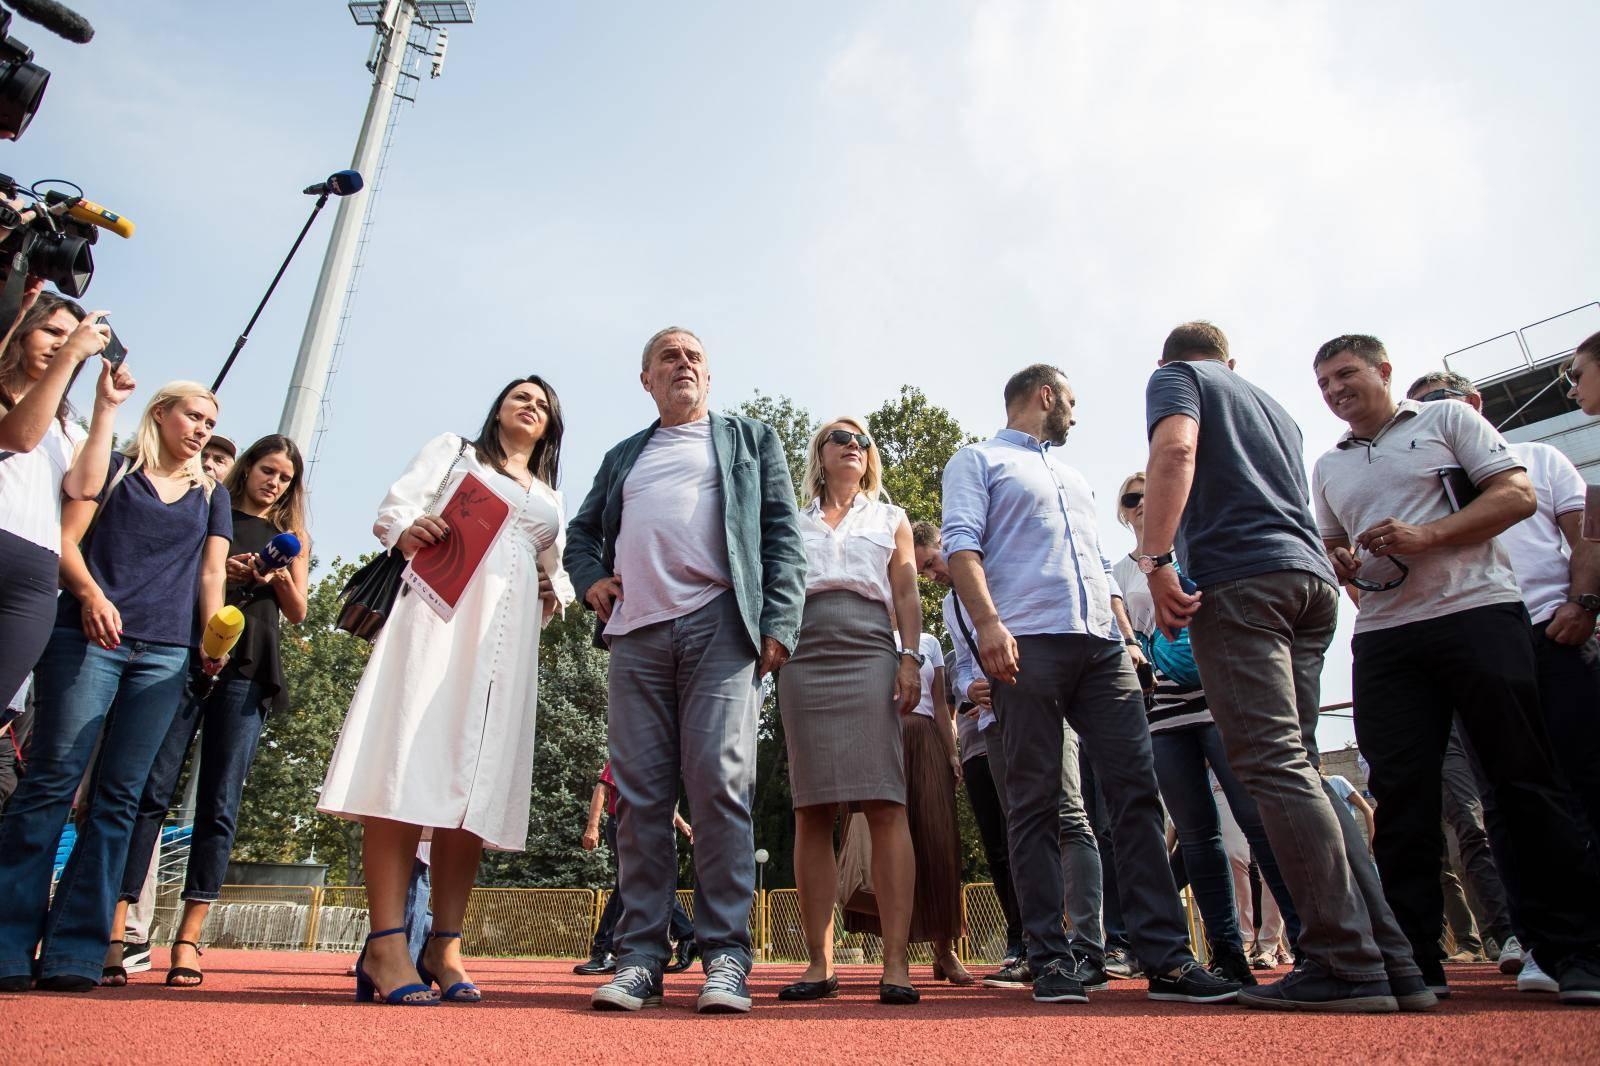 Zagreb: Obilazak atletske staze na Mladosti uoči Hanžekovićevog memorijala